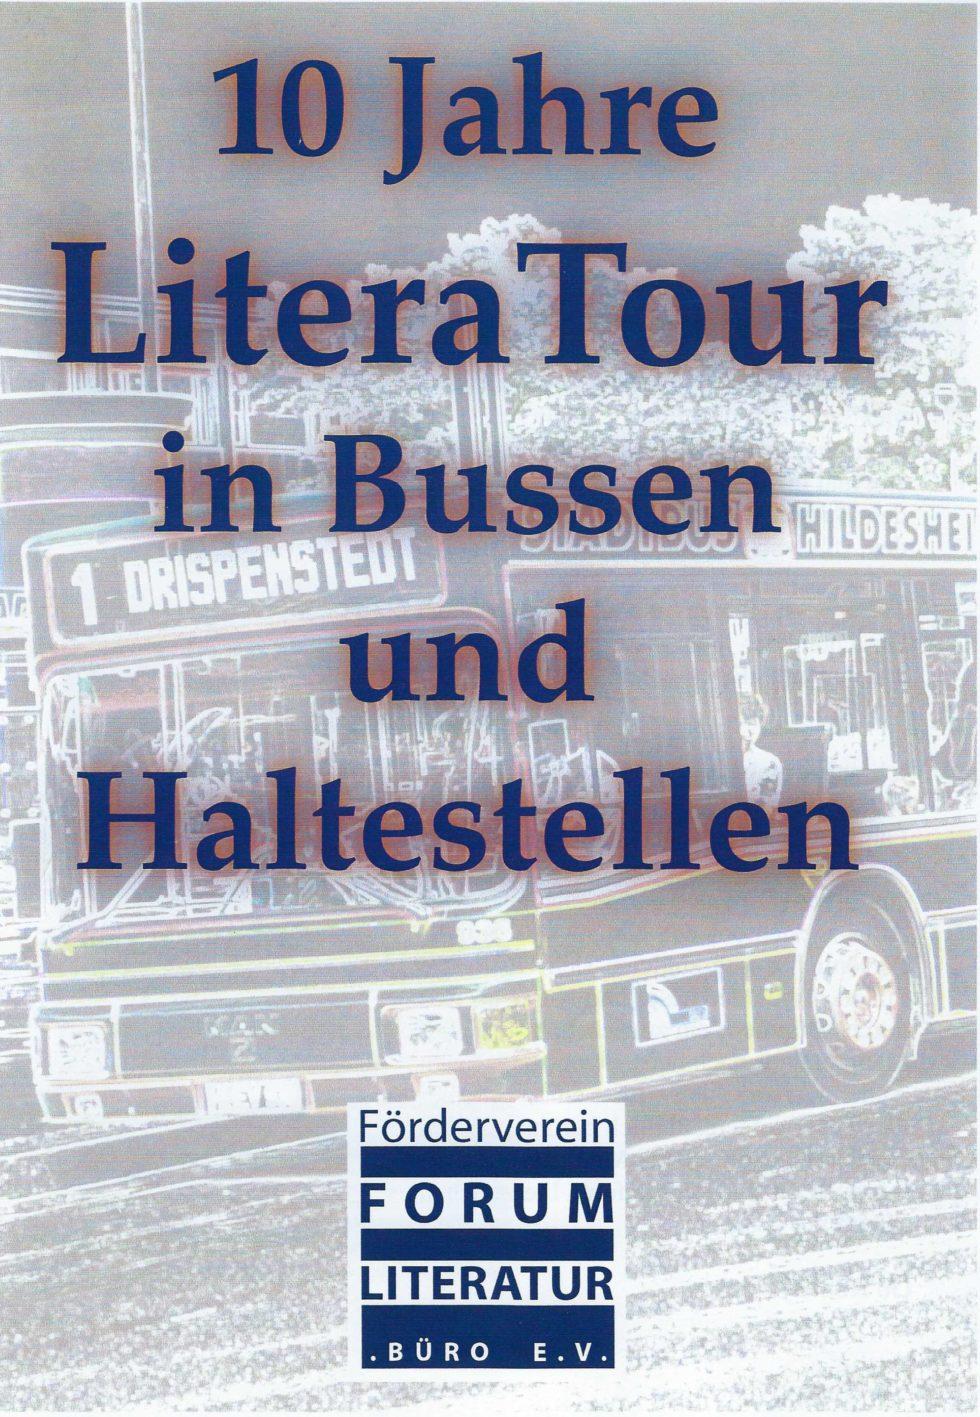 2008_Literatour_1